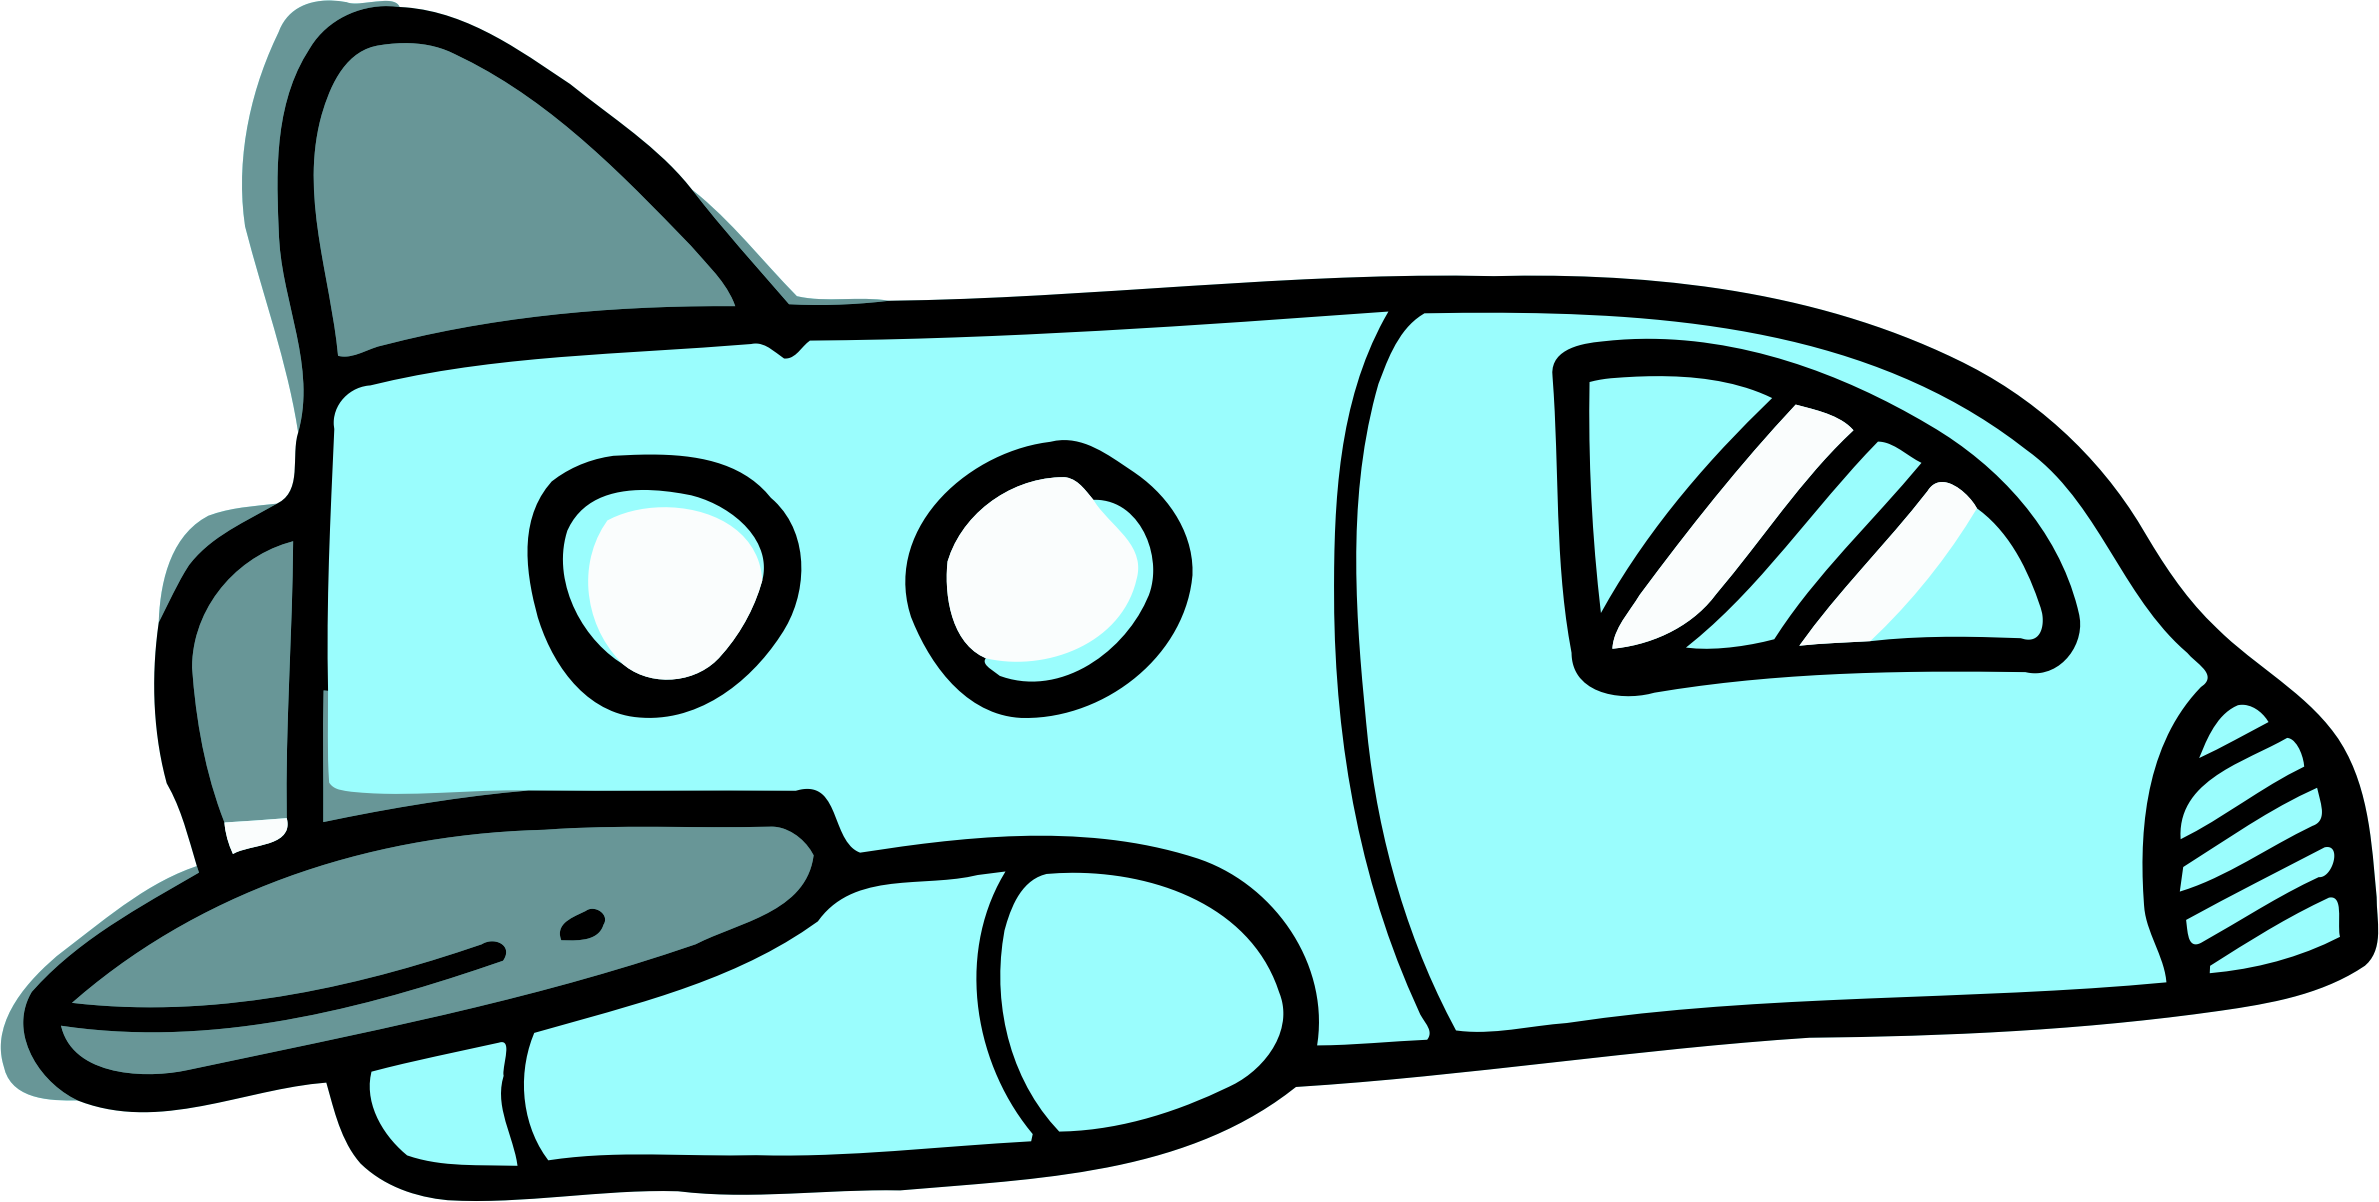 Space shuttle big image. Coloring clipart door